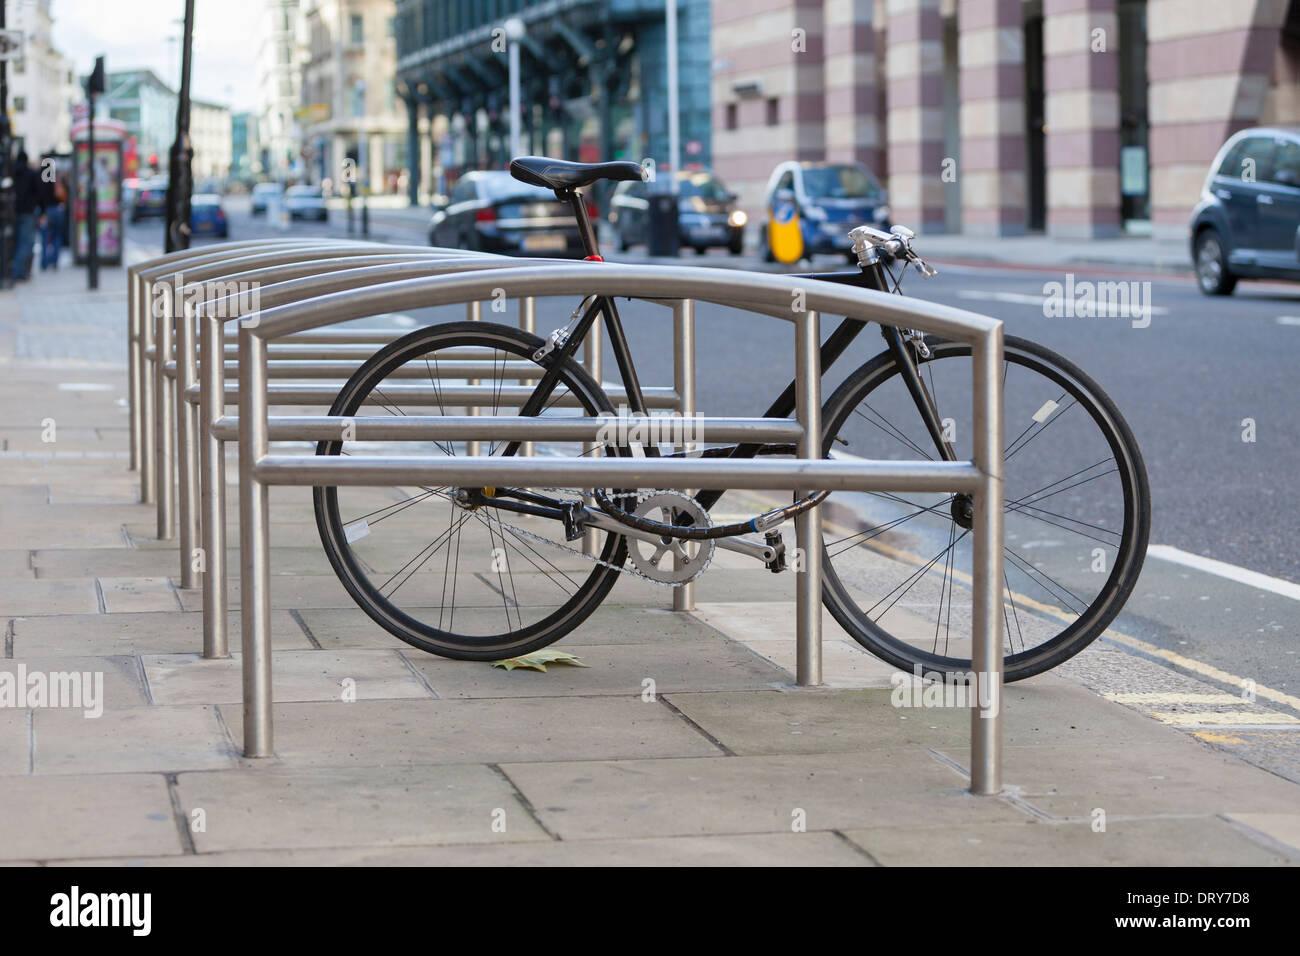 Bike at a bike stand, London, England - Stock Image